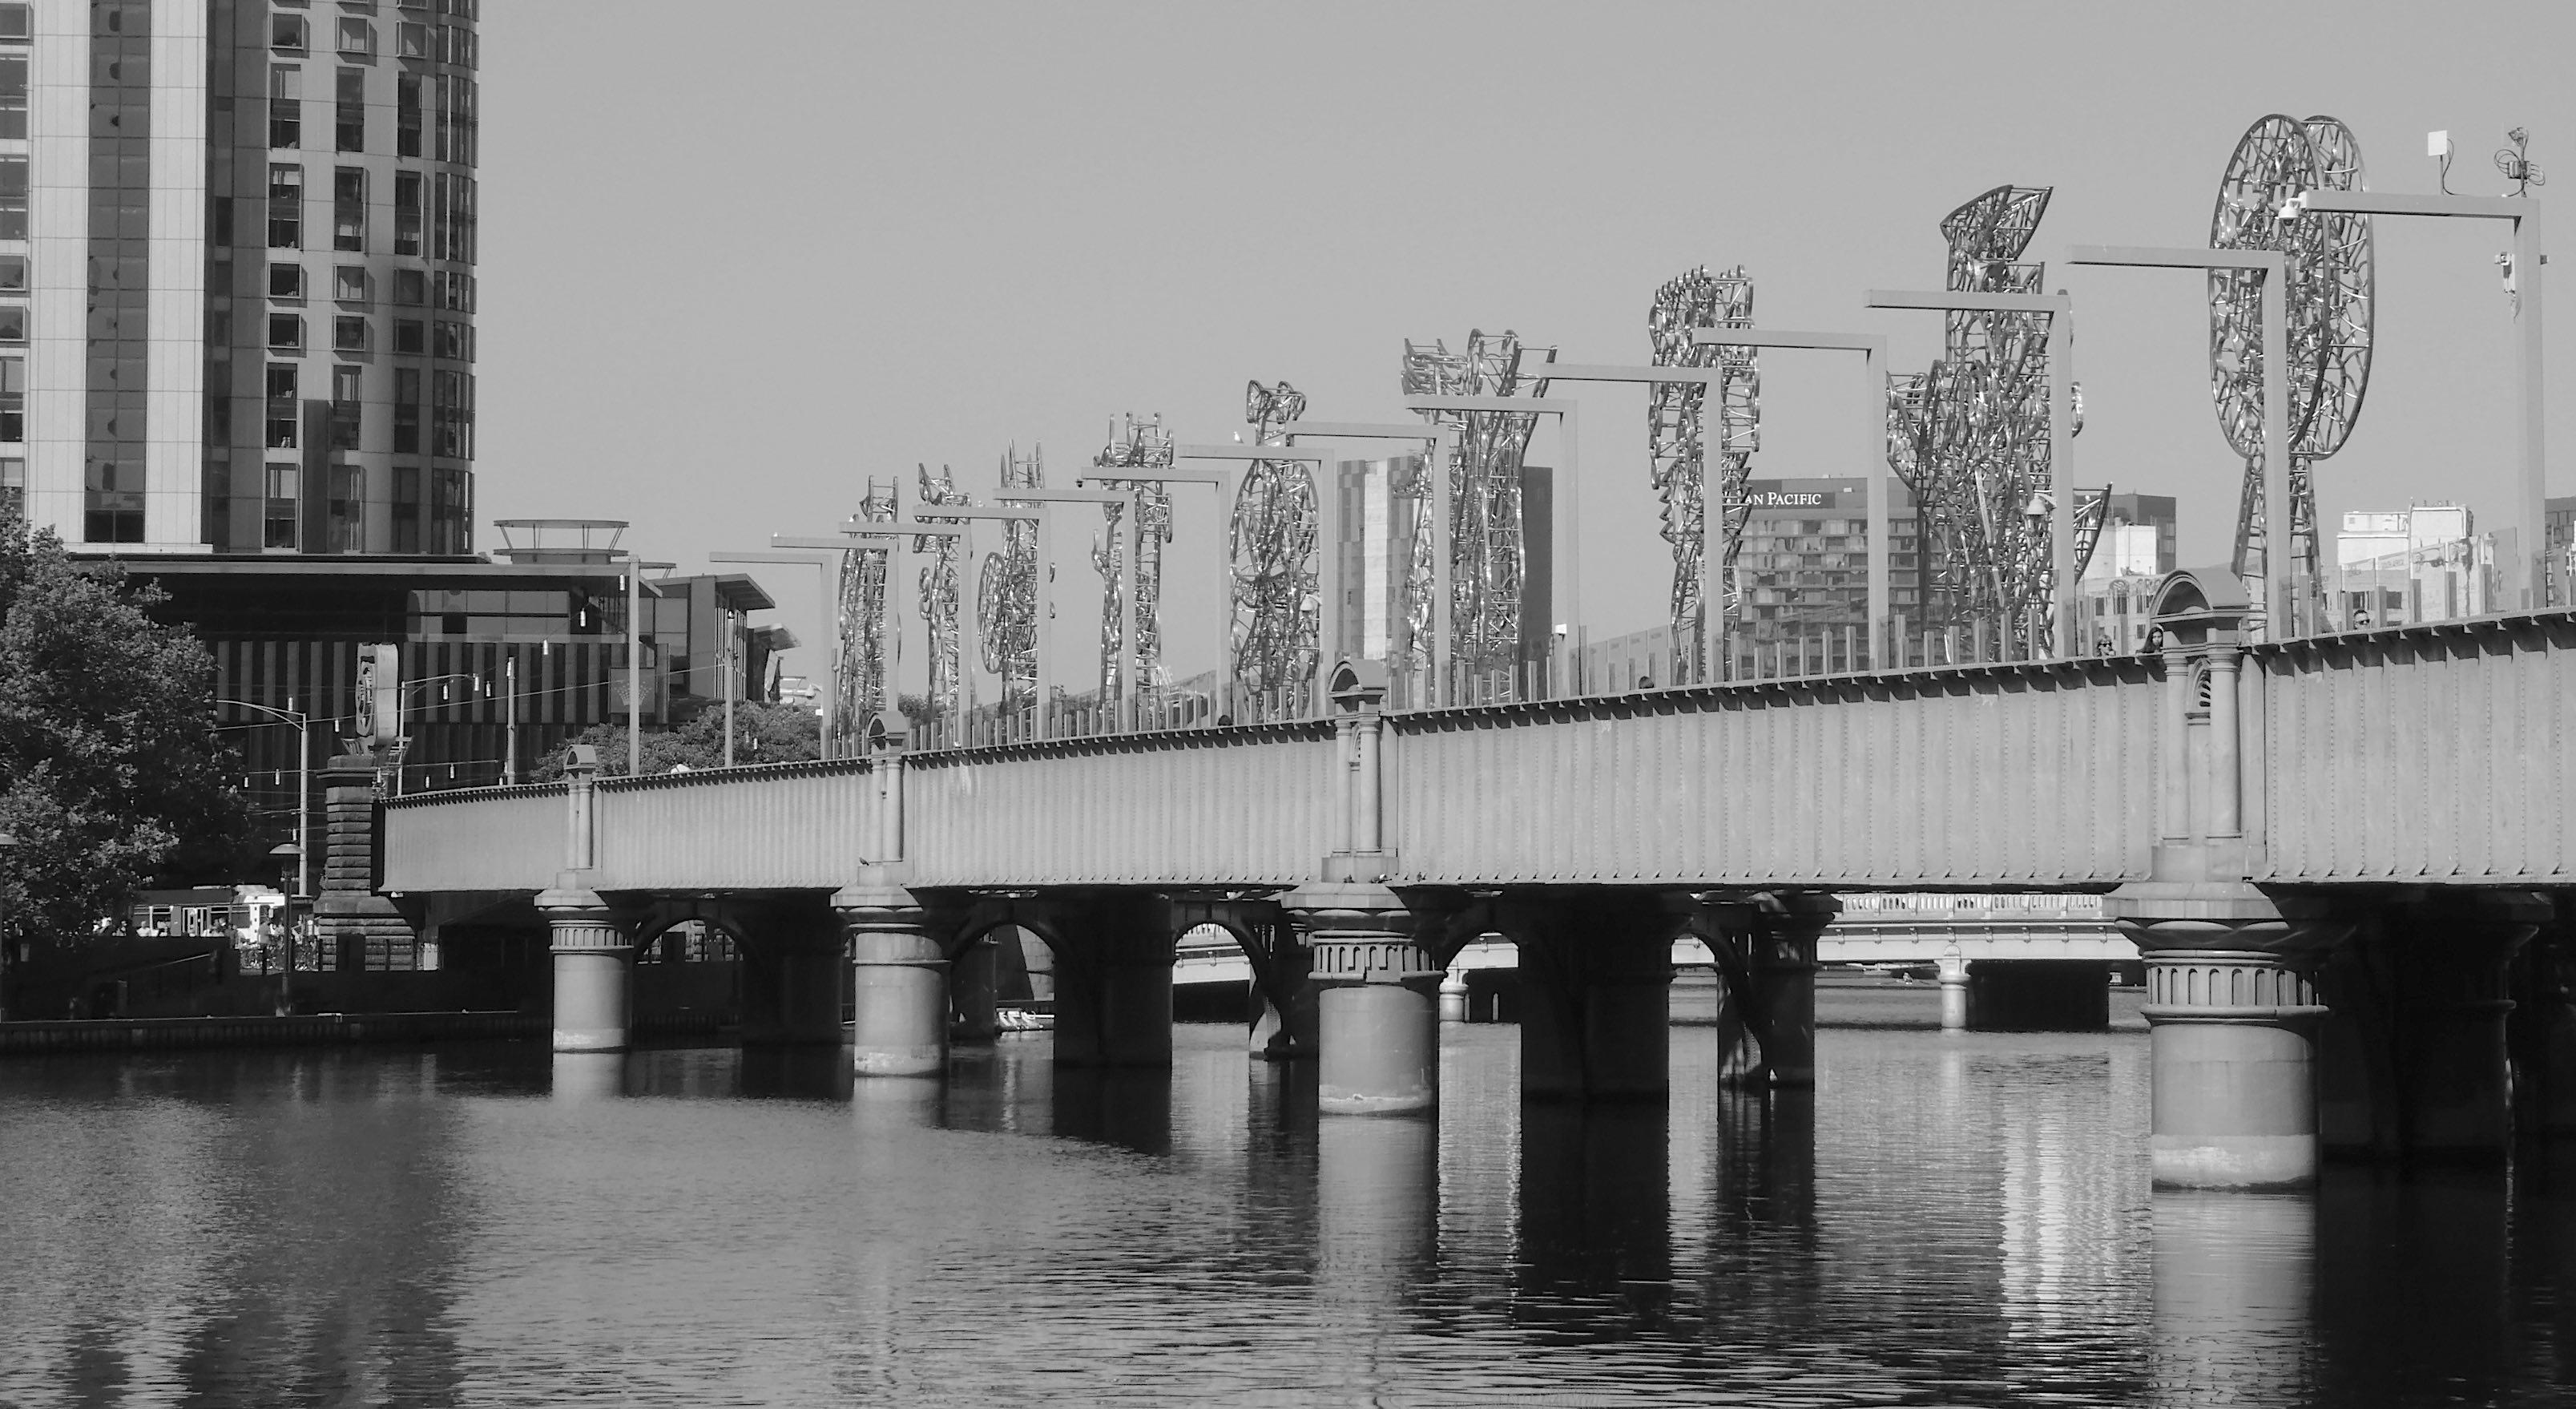 8.Sandridge Bridge sculptures